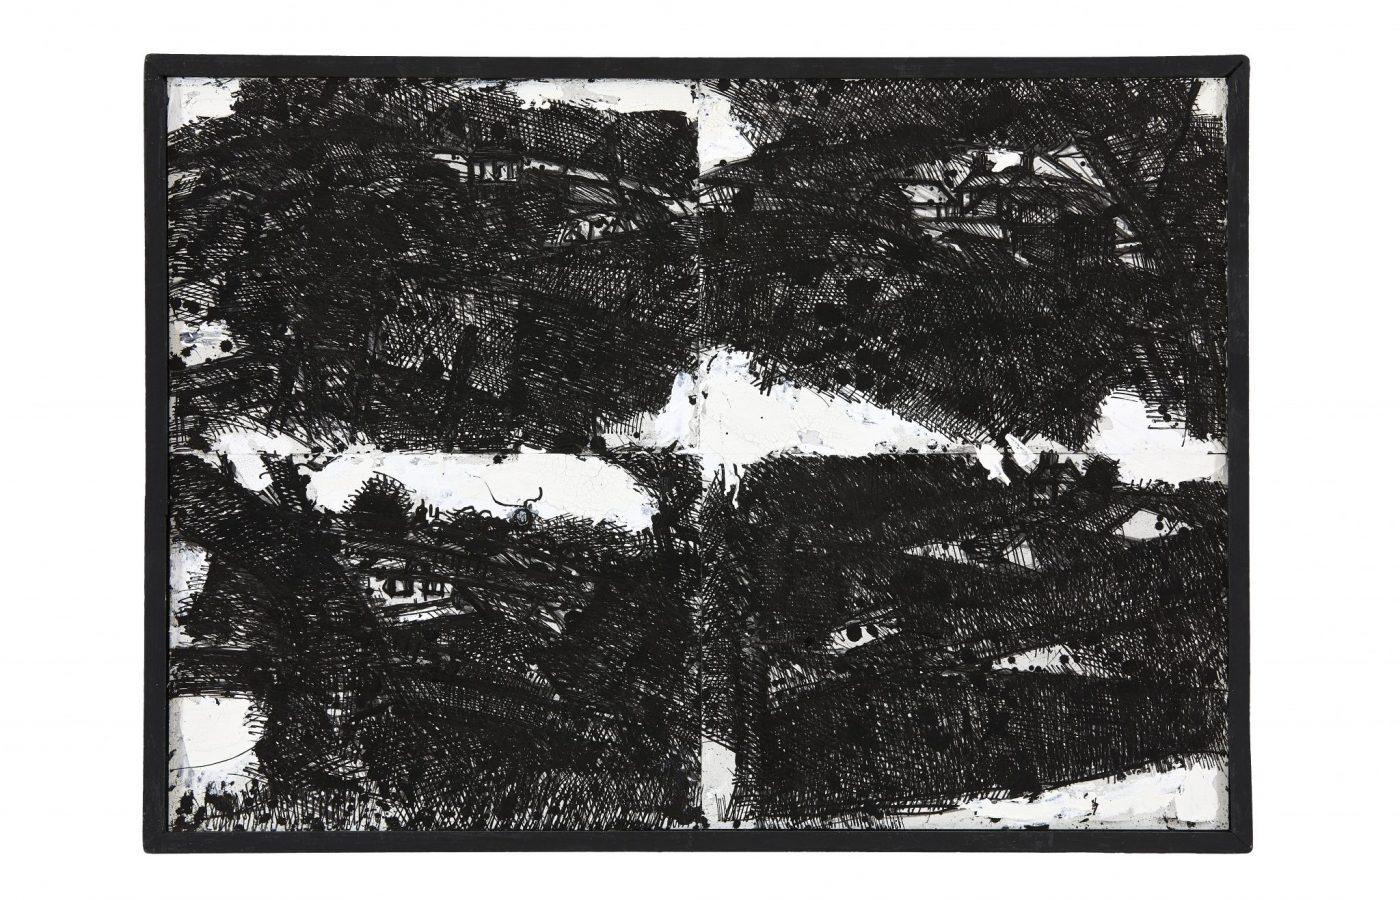 FXF18-10 John Virtue Landscape No 120 1990-91